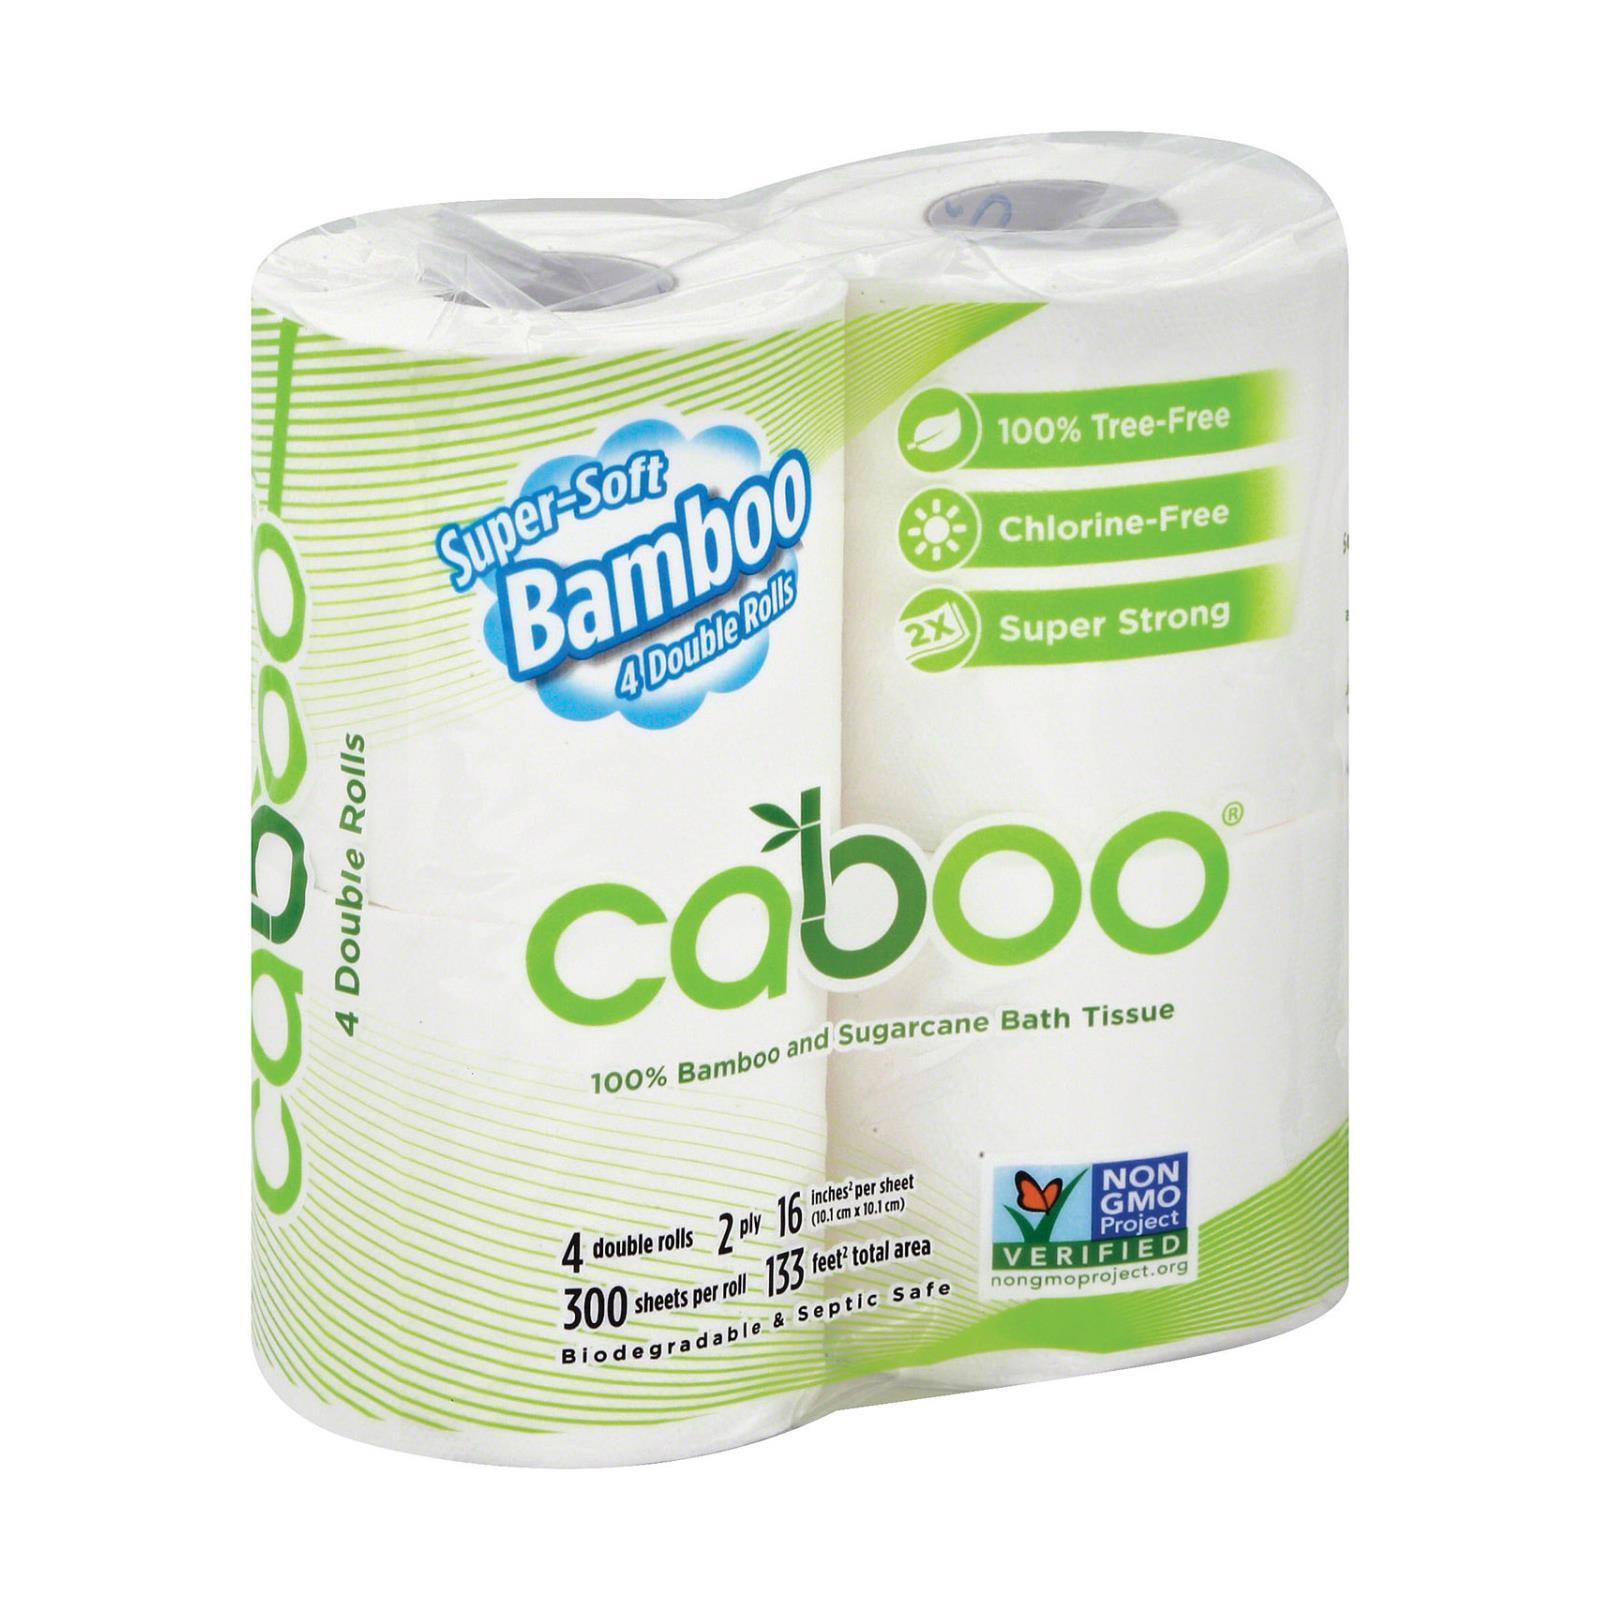 Caboo Bathroom Tissue - Case of 10